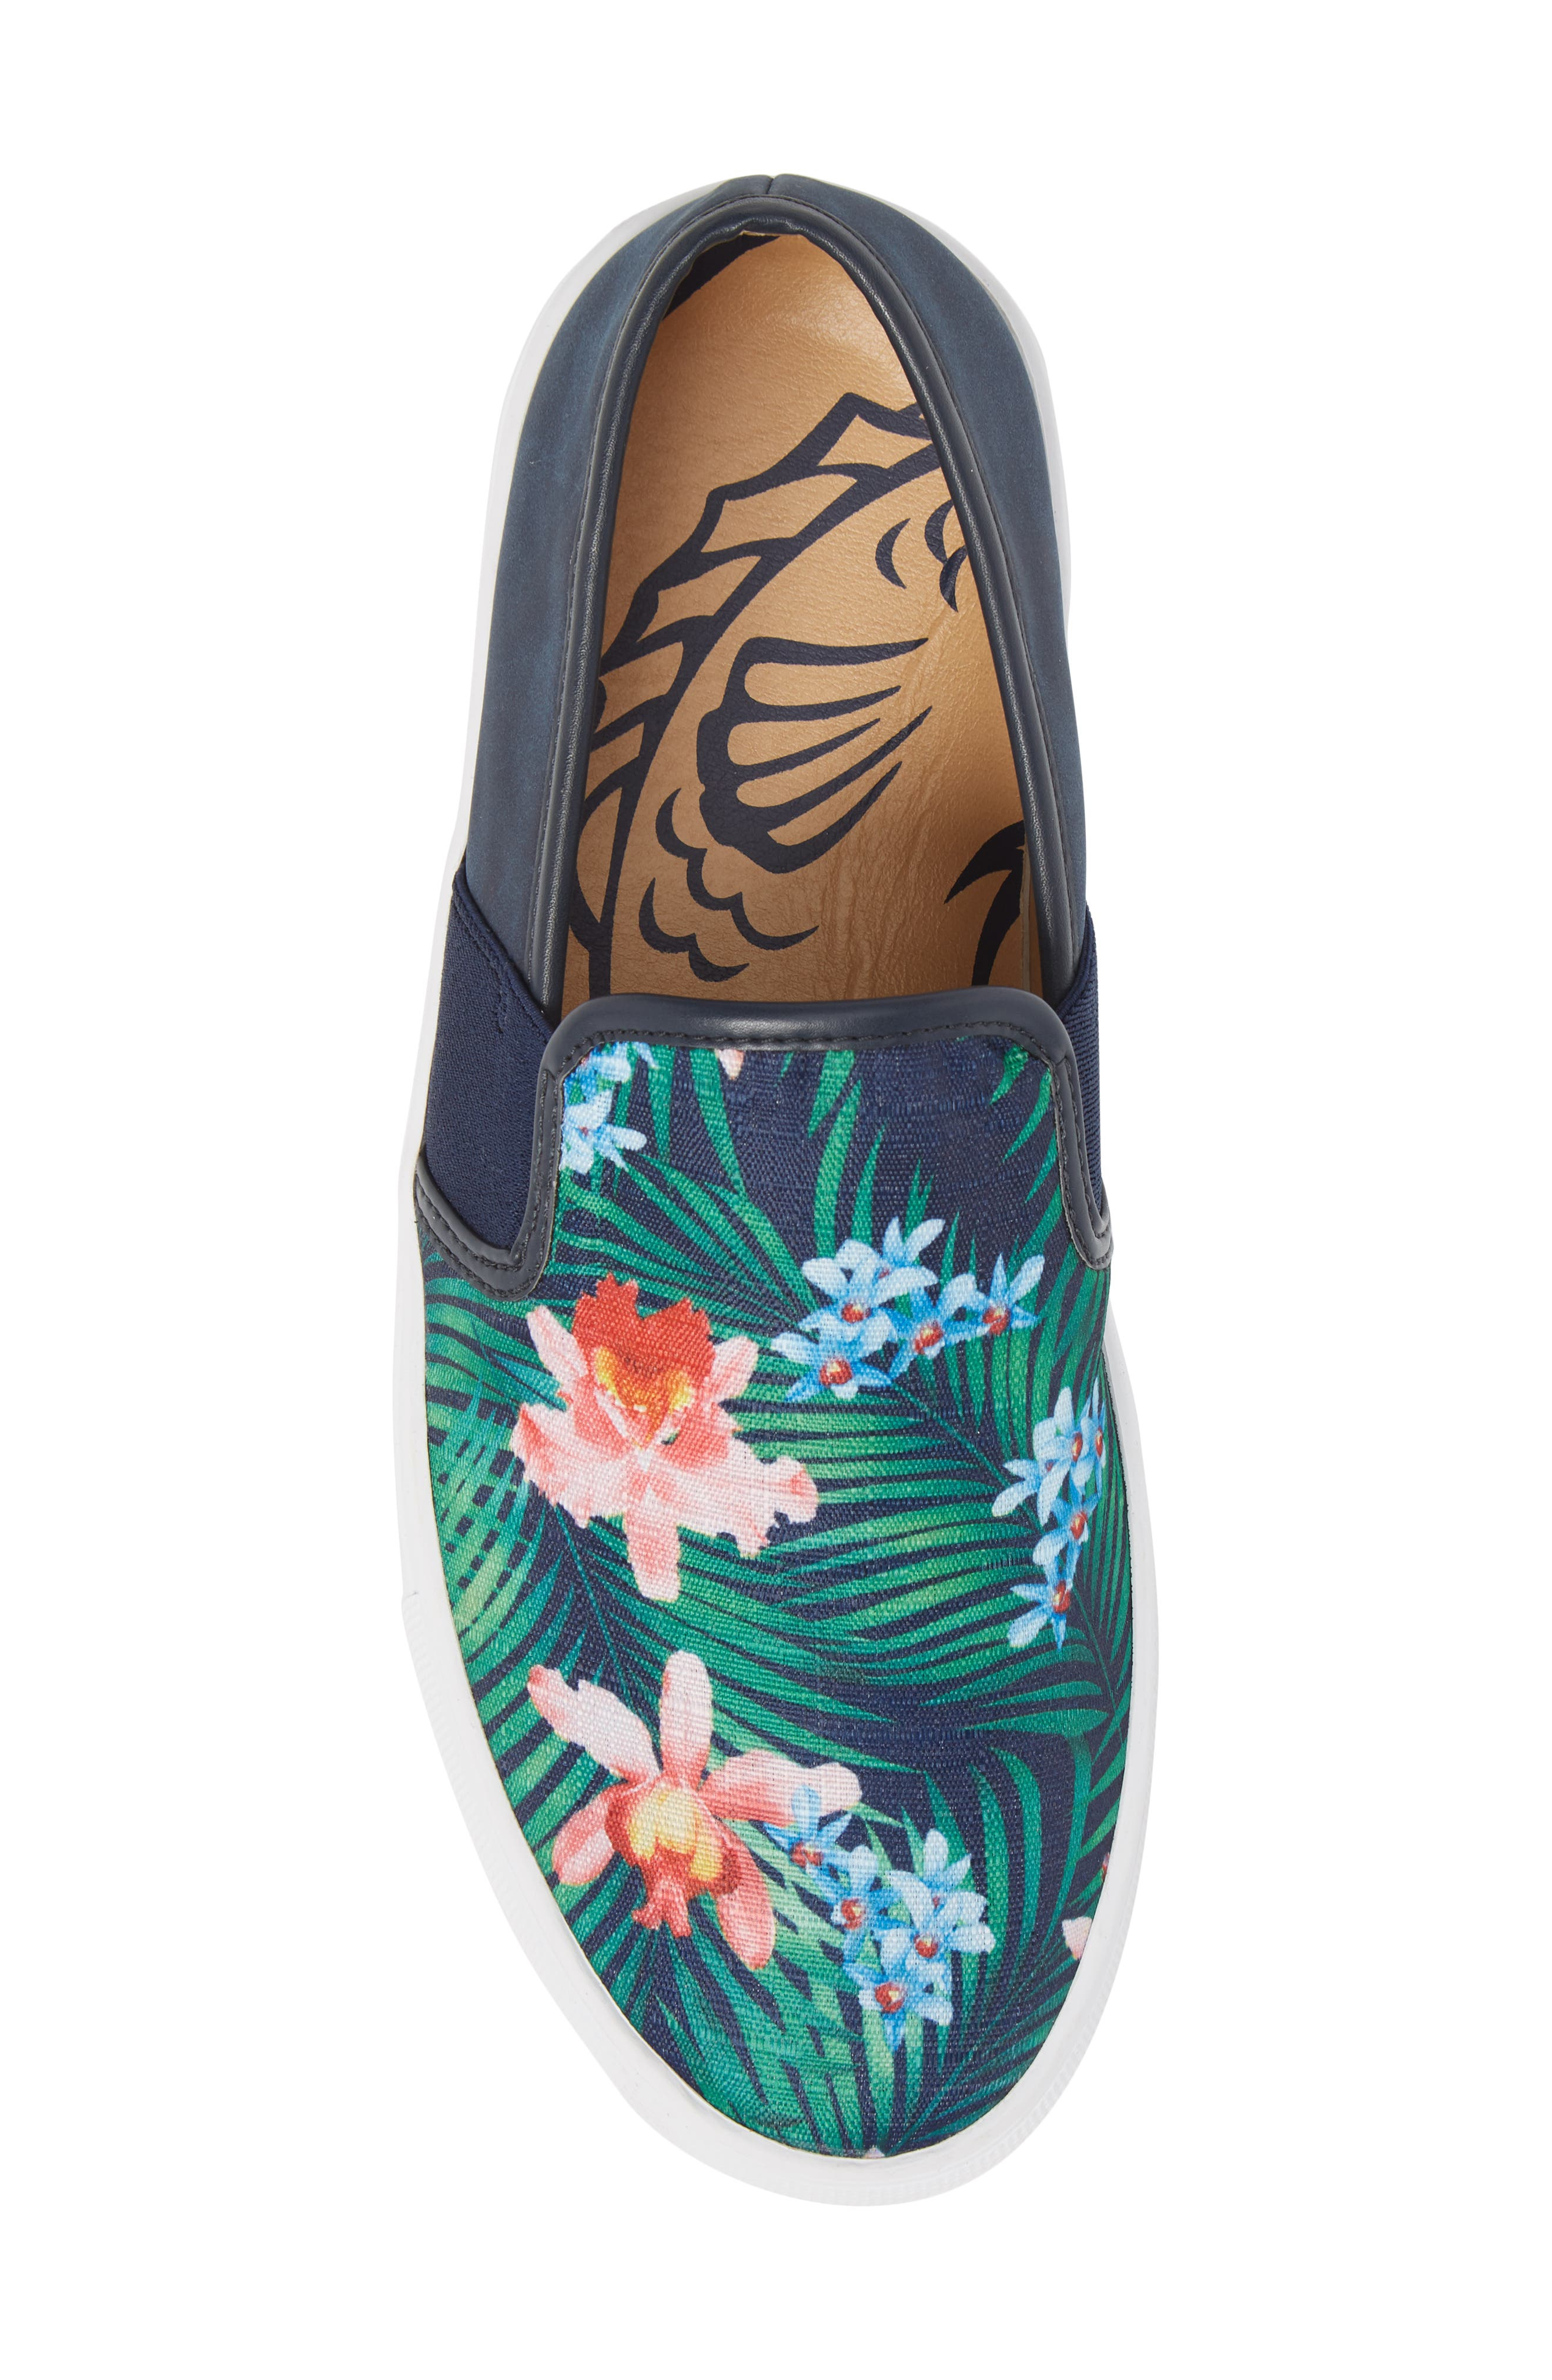 Fish 'N' Chips Bali Slip-On Sneaker,                             Alternate thumbnail 5, color,                             Navy Multi Fabric